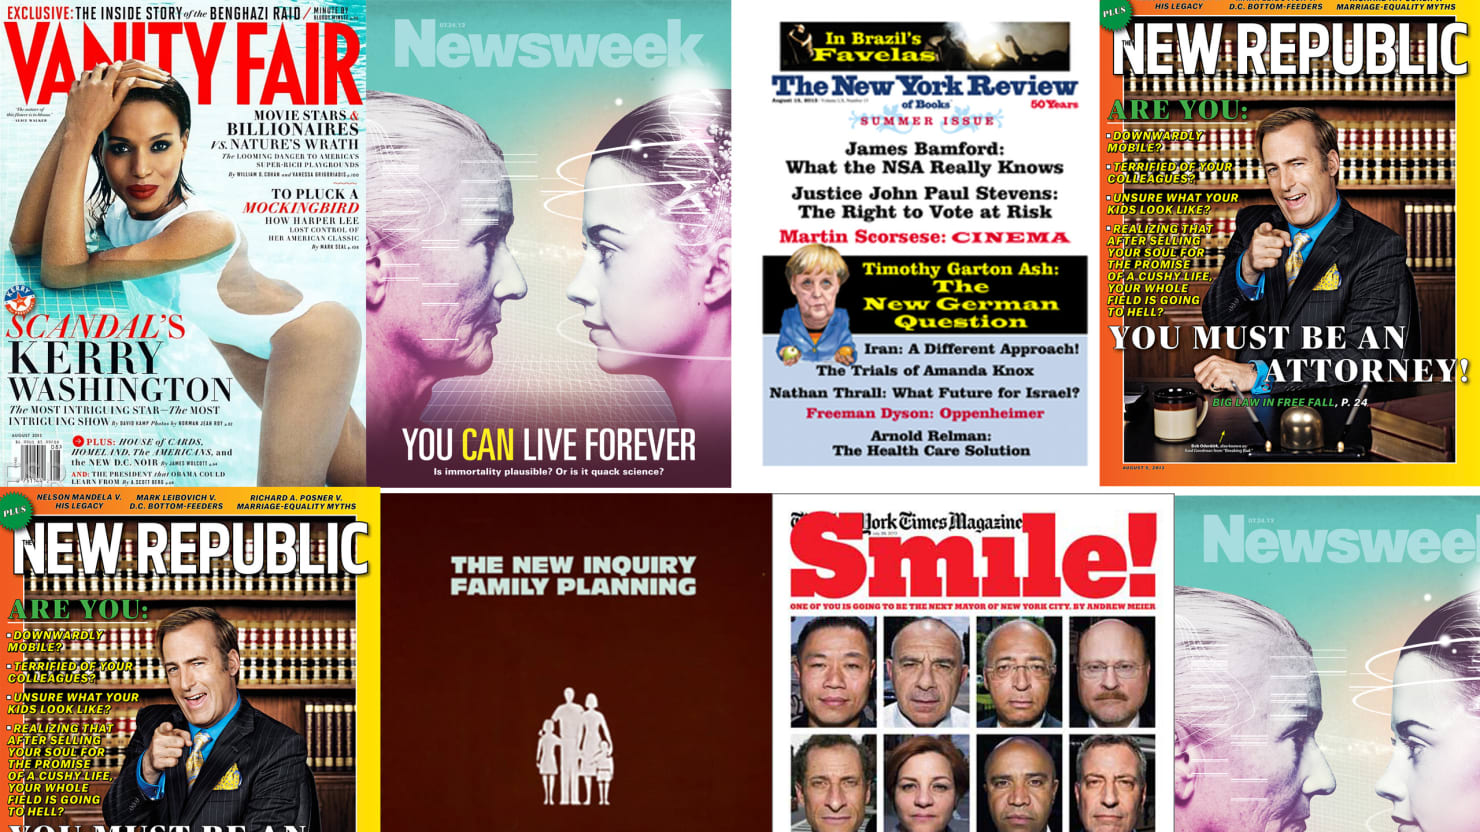 The Week's Best Longreads for July 27, 2013